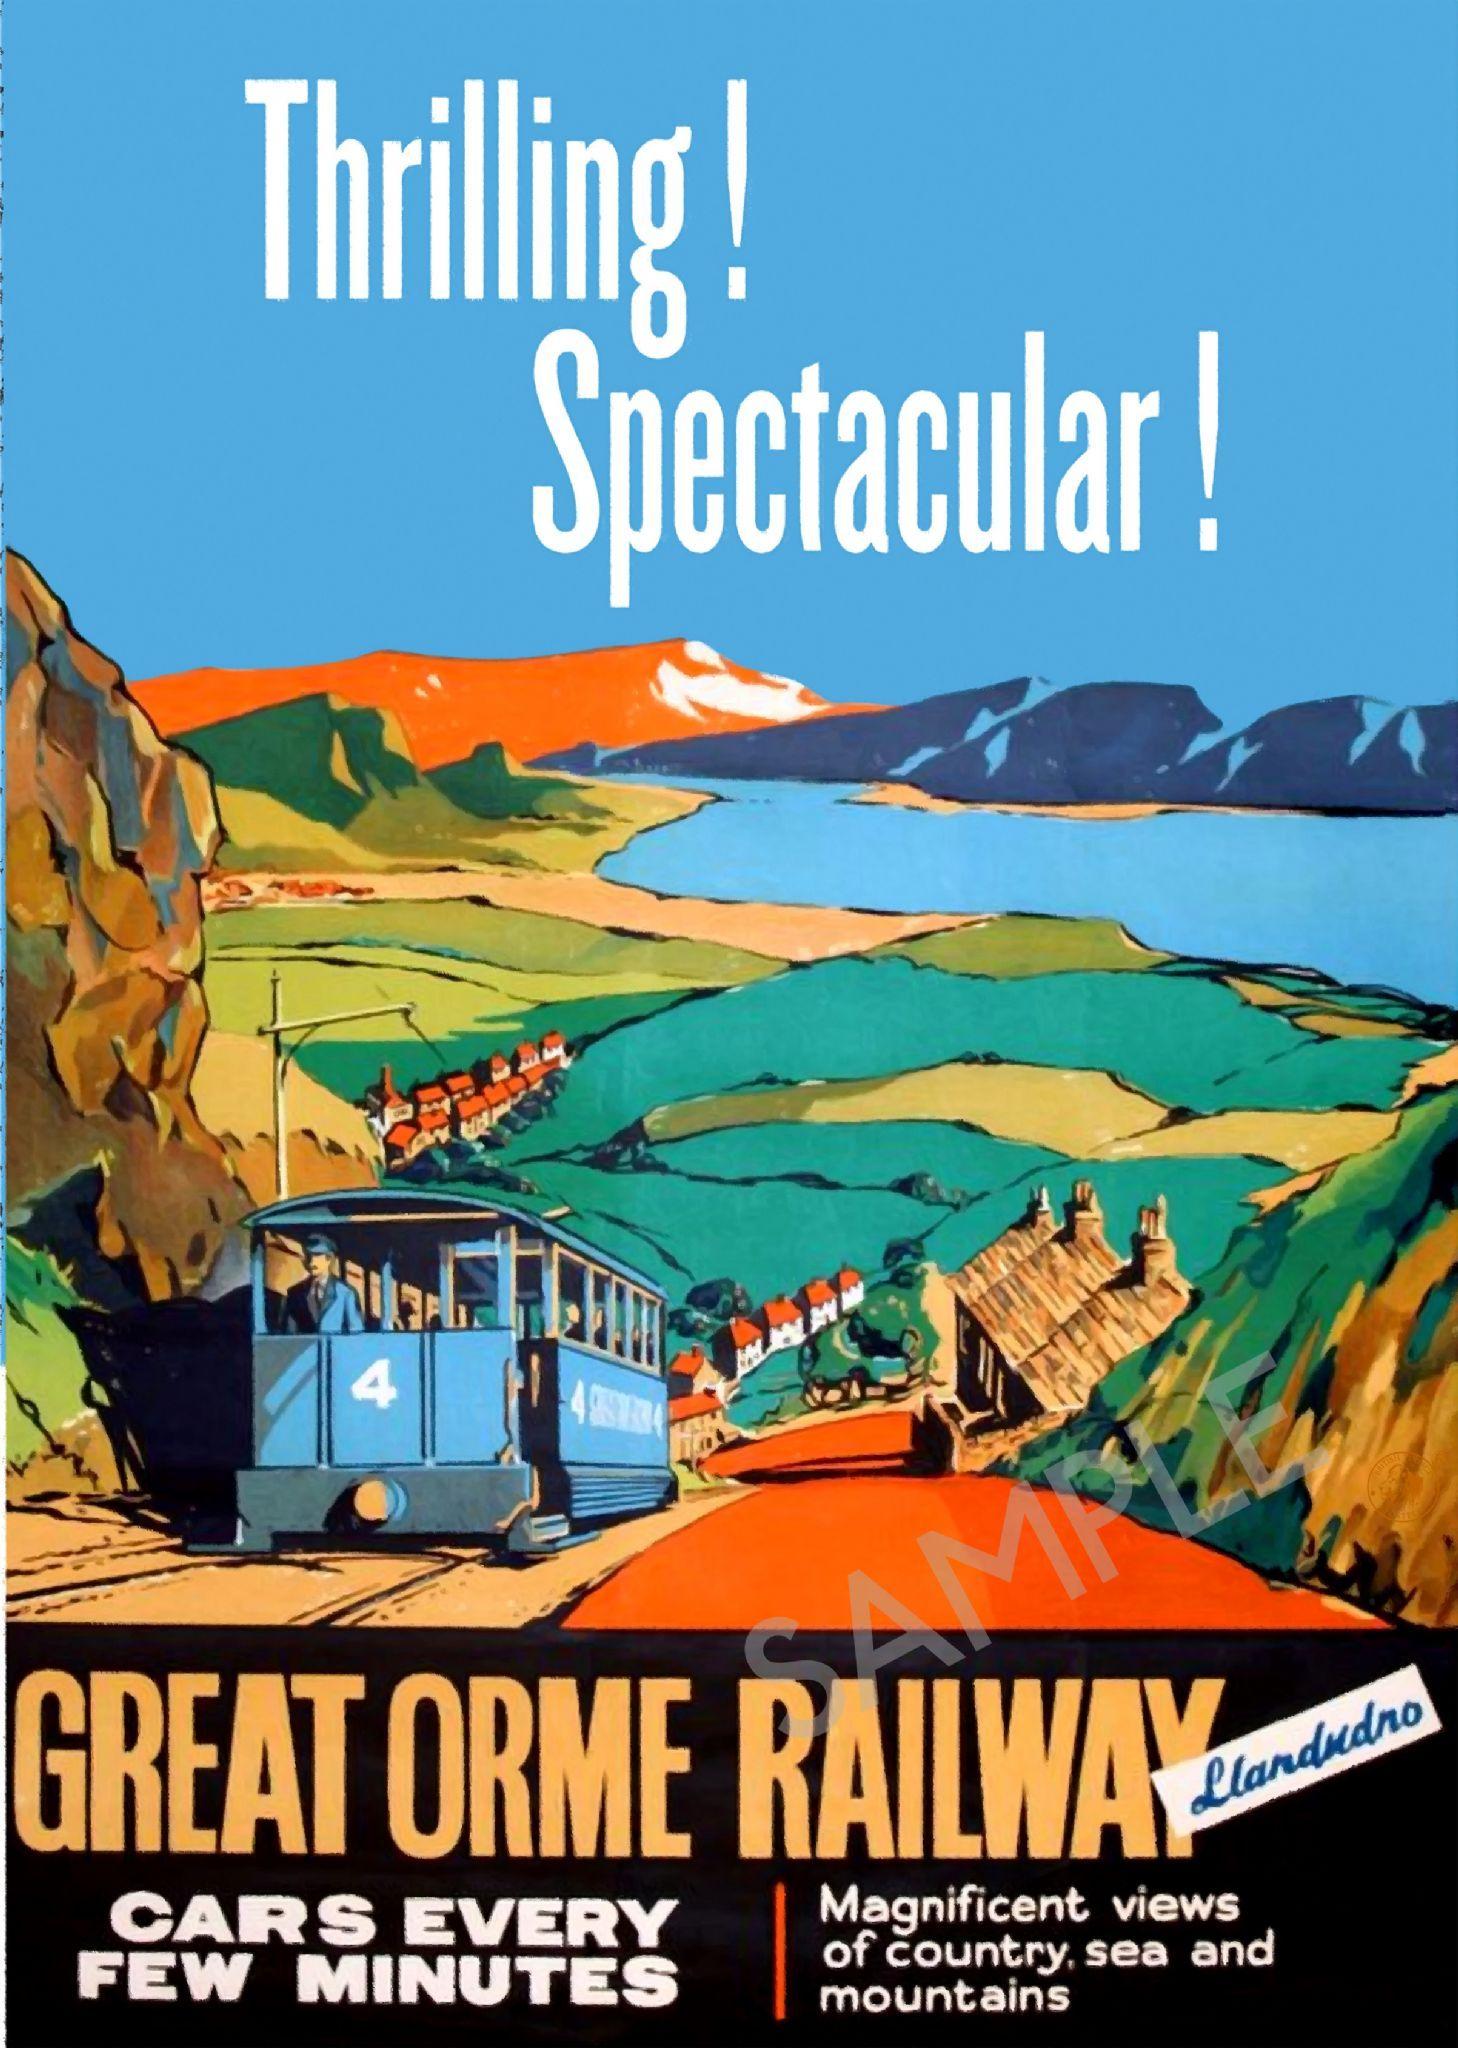 Great Orme Railway, Llandudno - North Wales #northwales